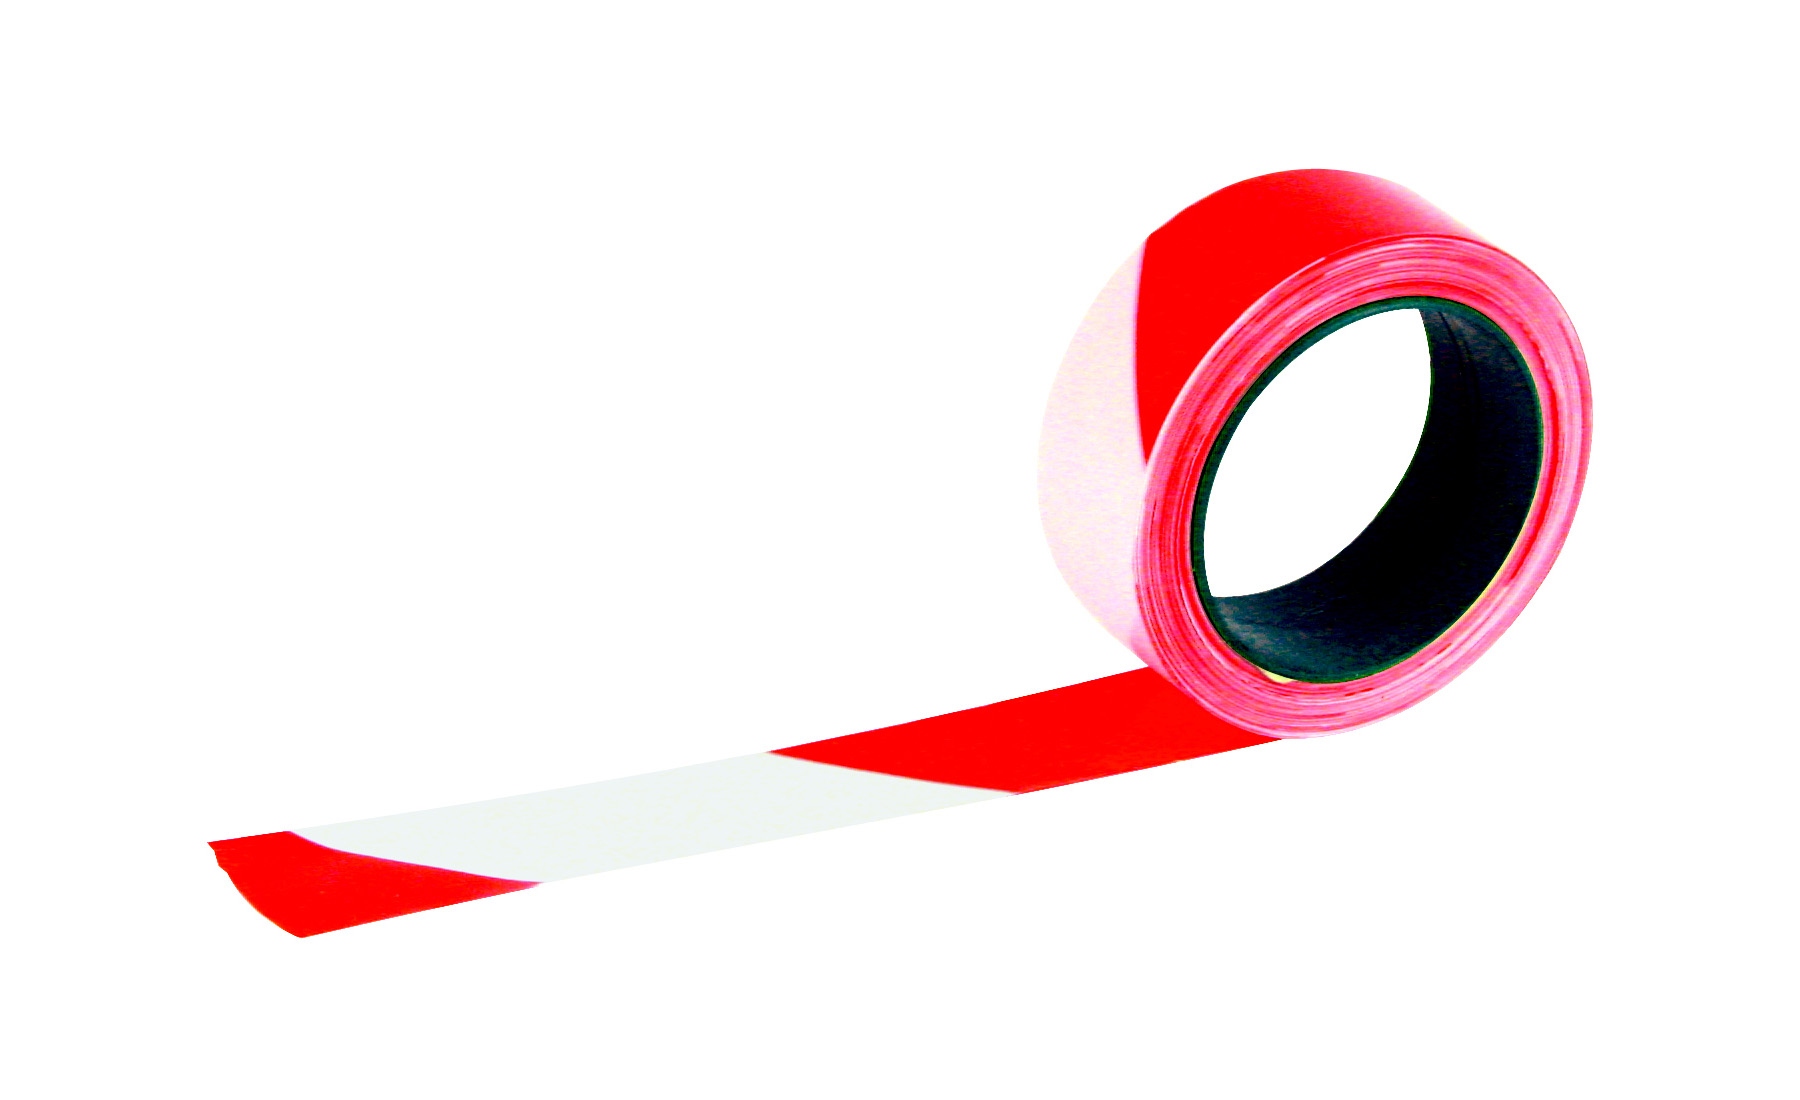 ruban rubaplast rubalise rouge et blanc 50 mm x 100 m taliaplast krenobat outillage. Black Bedroom Furniture Sets. Home Design Ideas